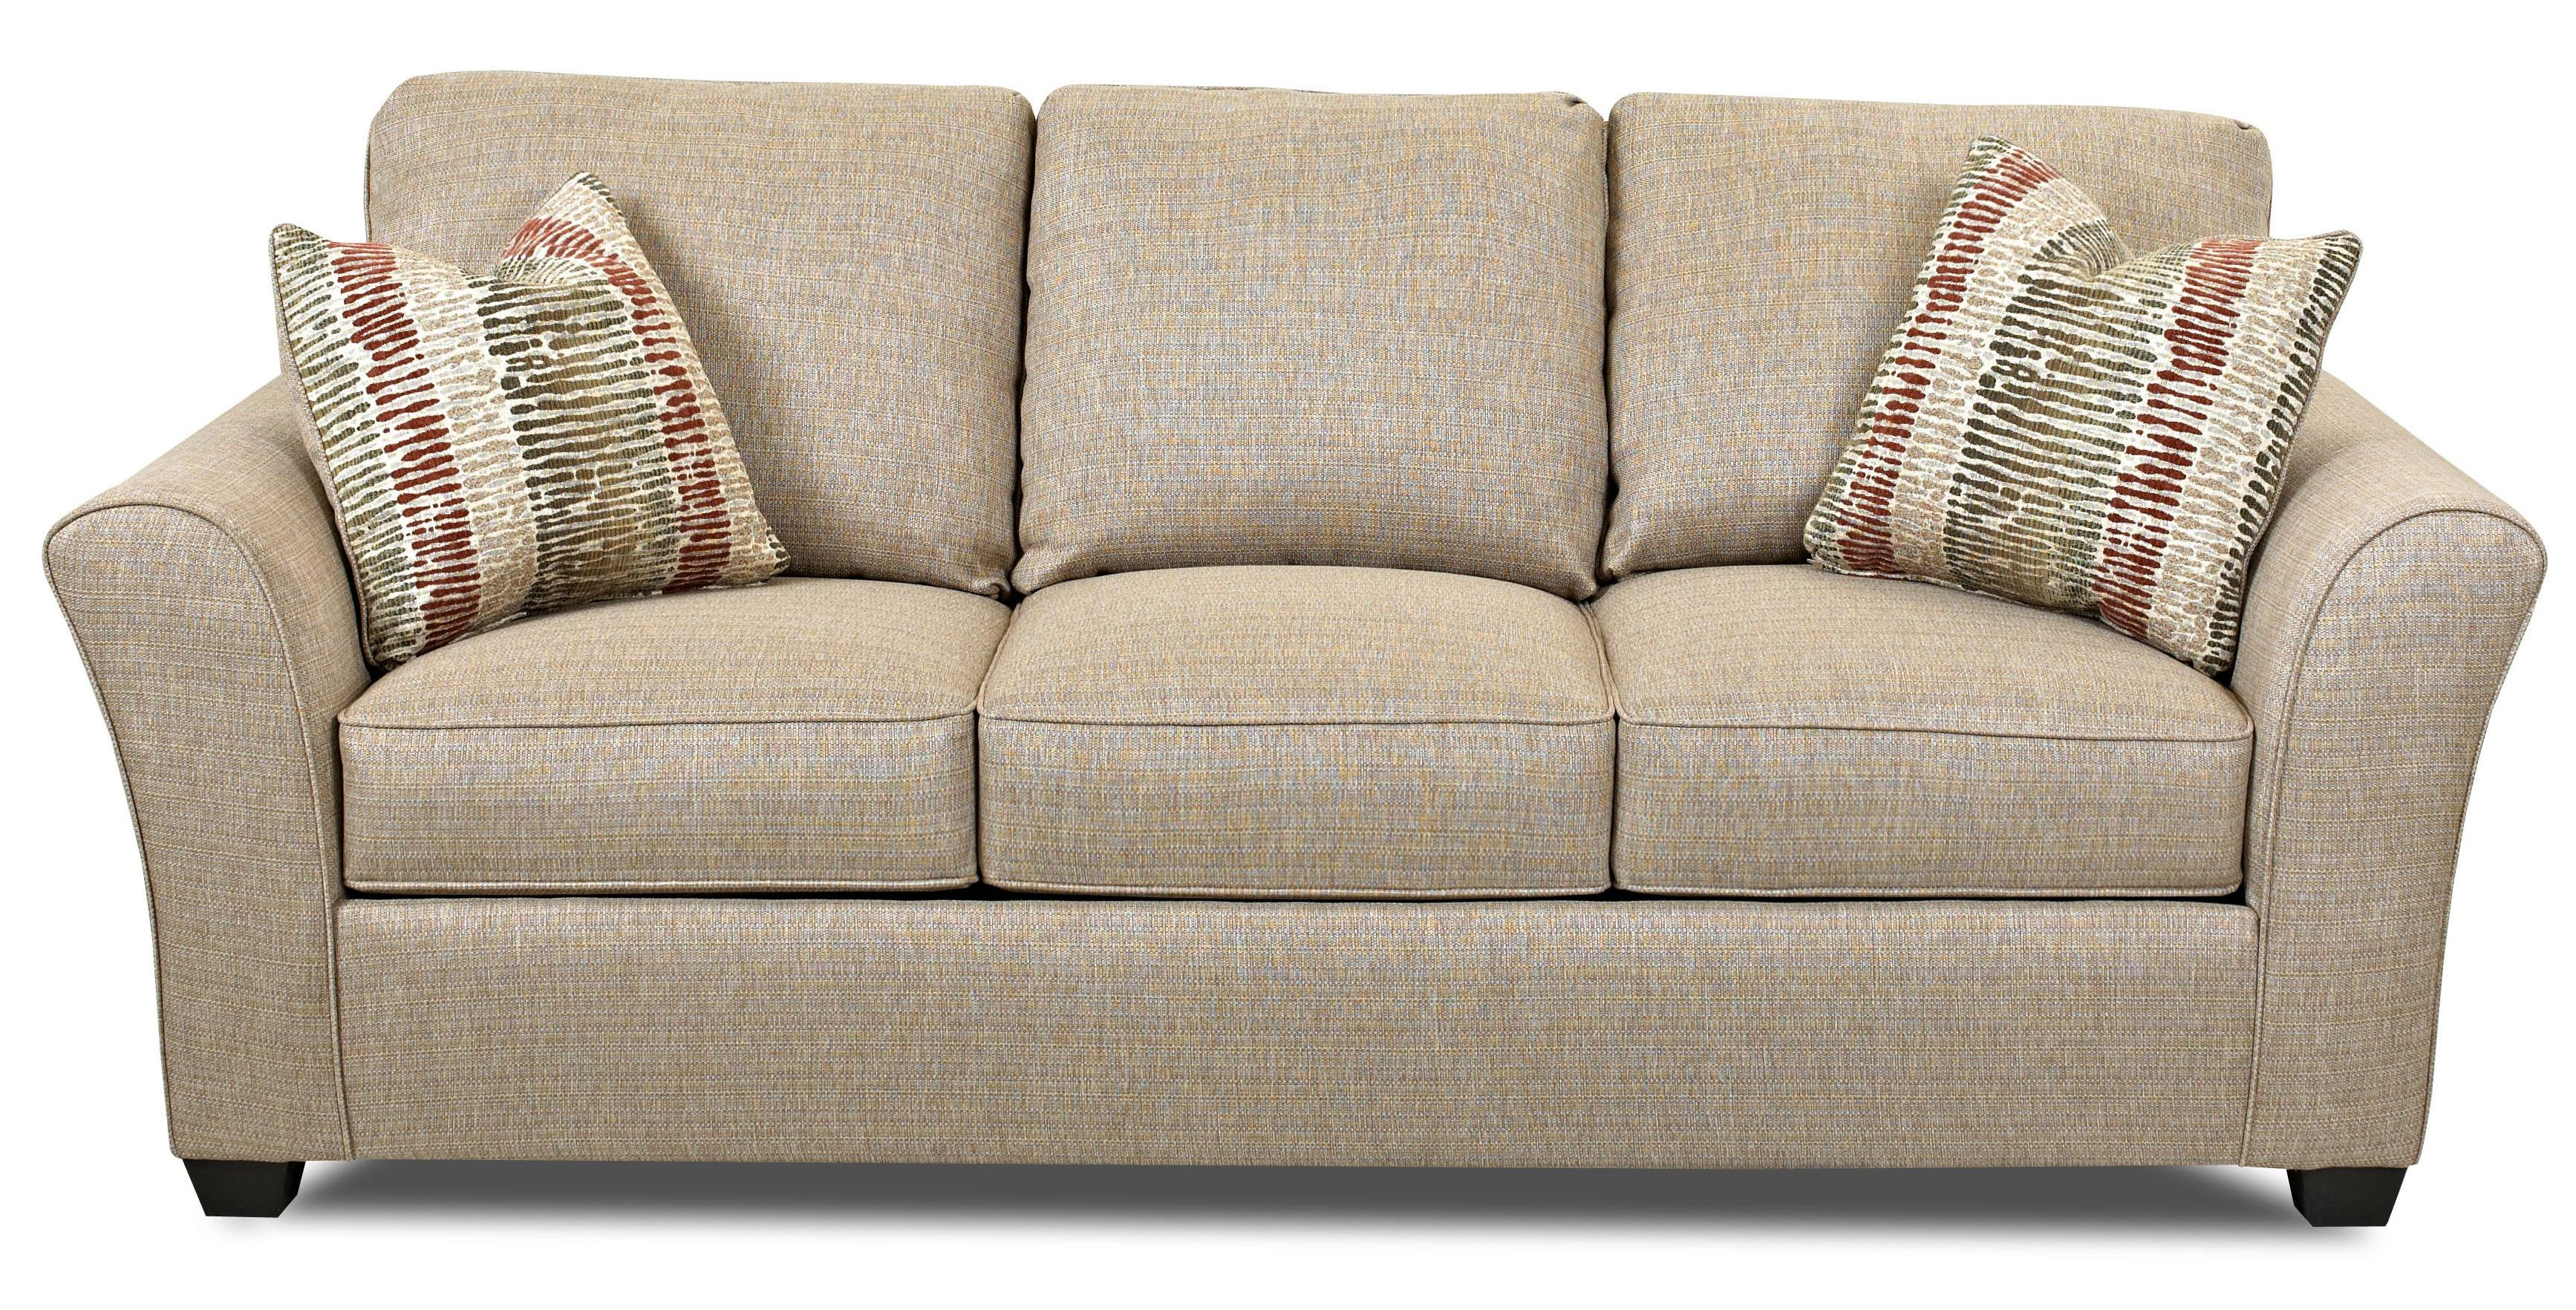 Transitional Sofa Sleeper